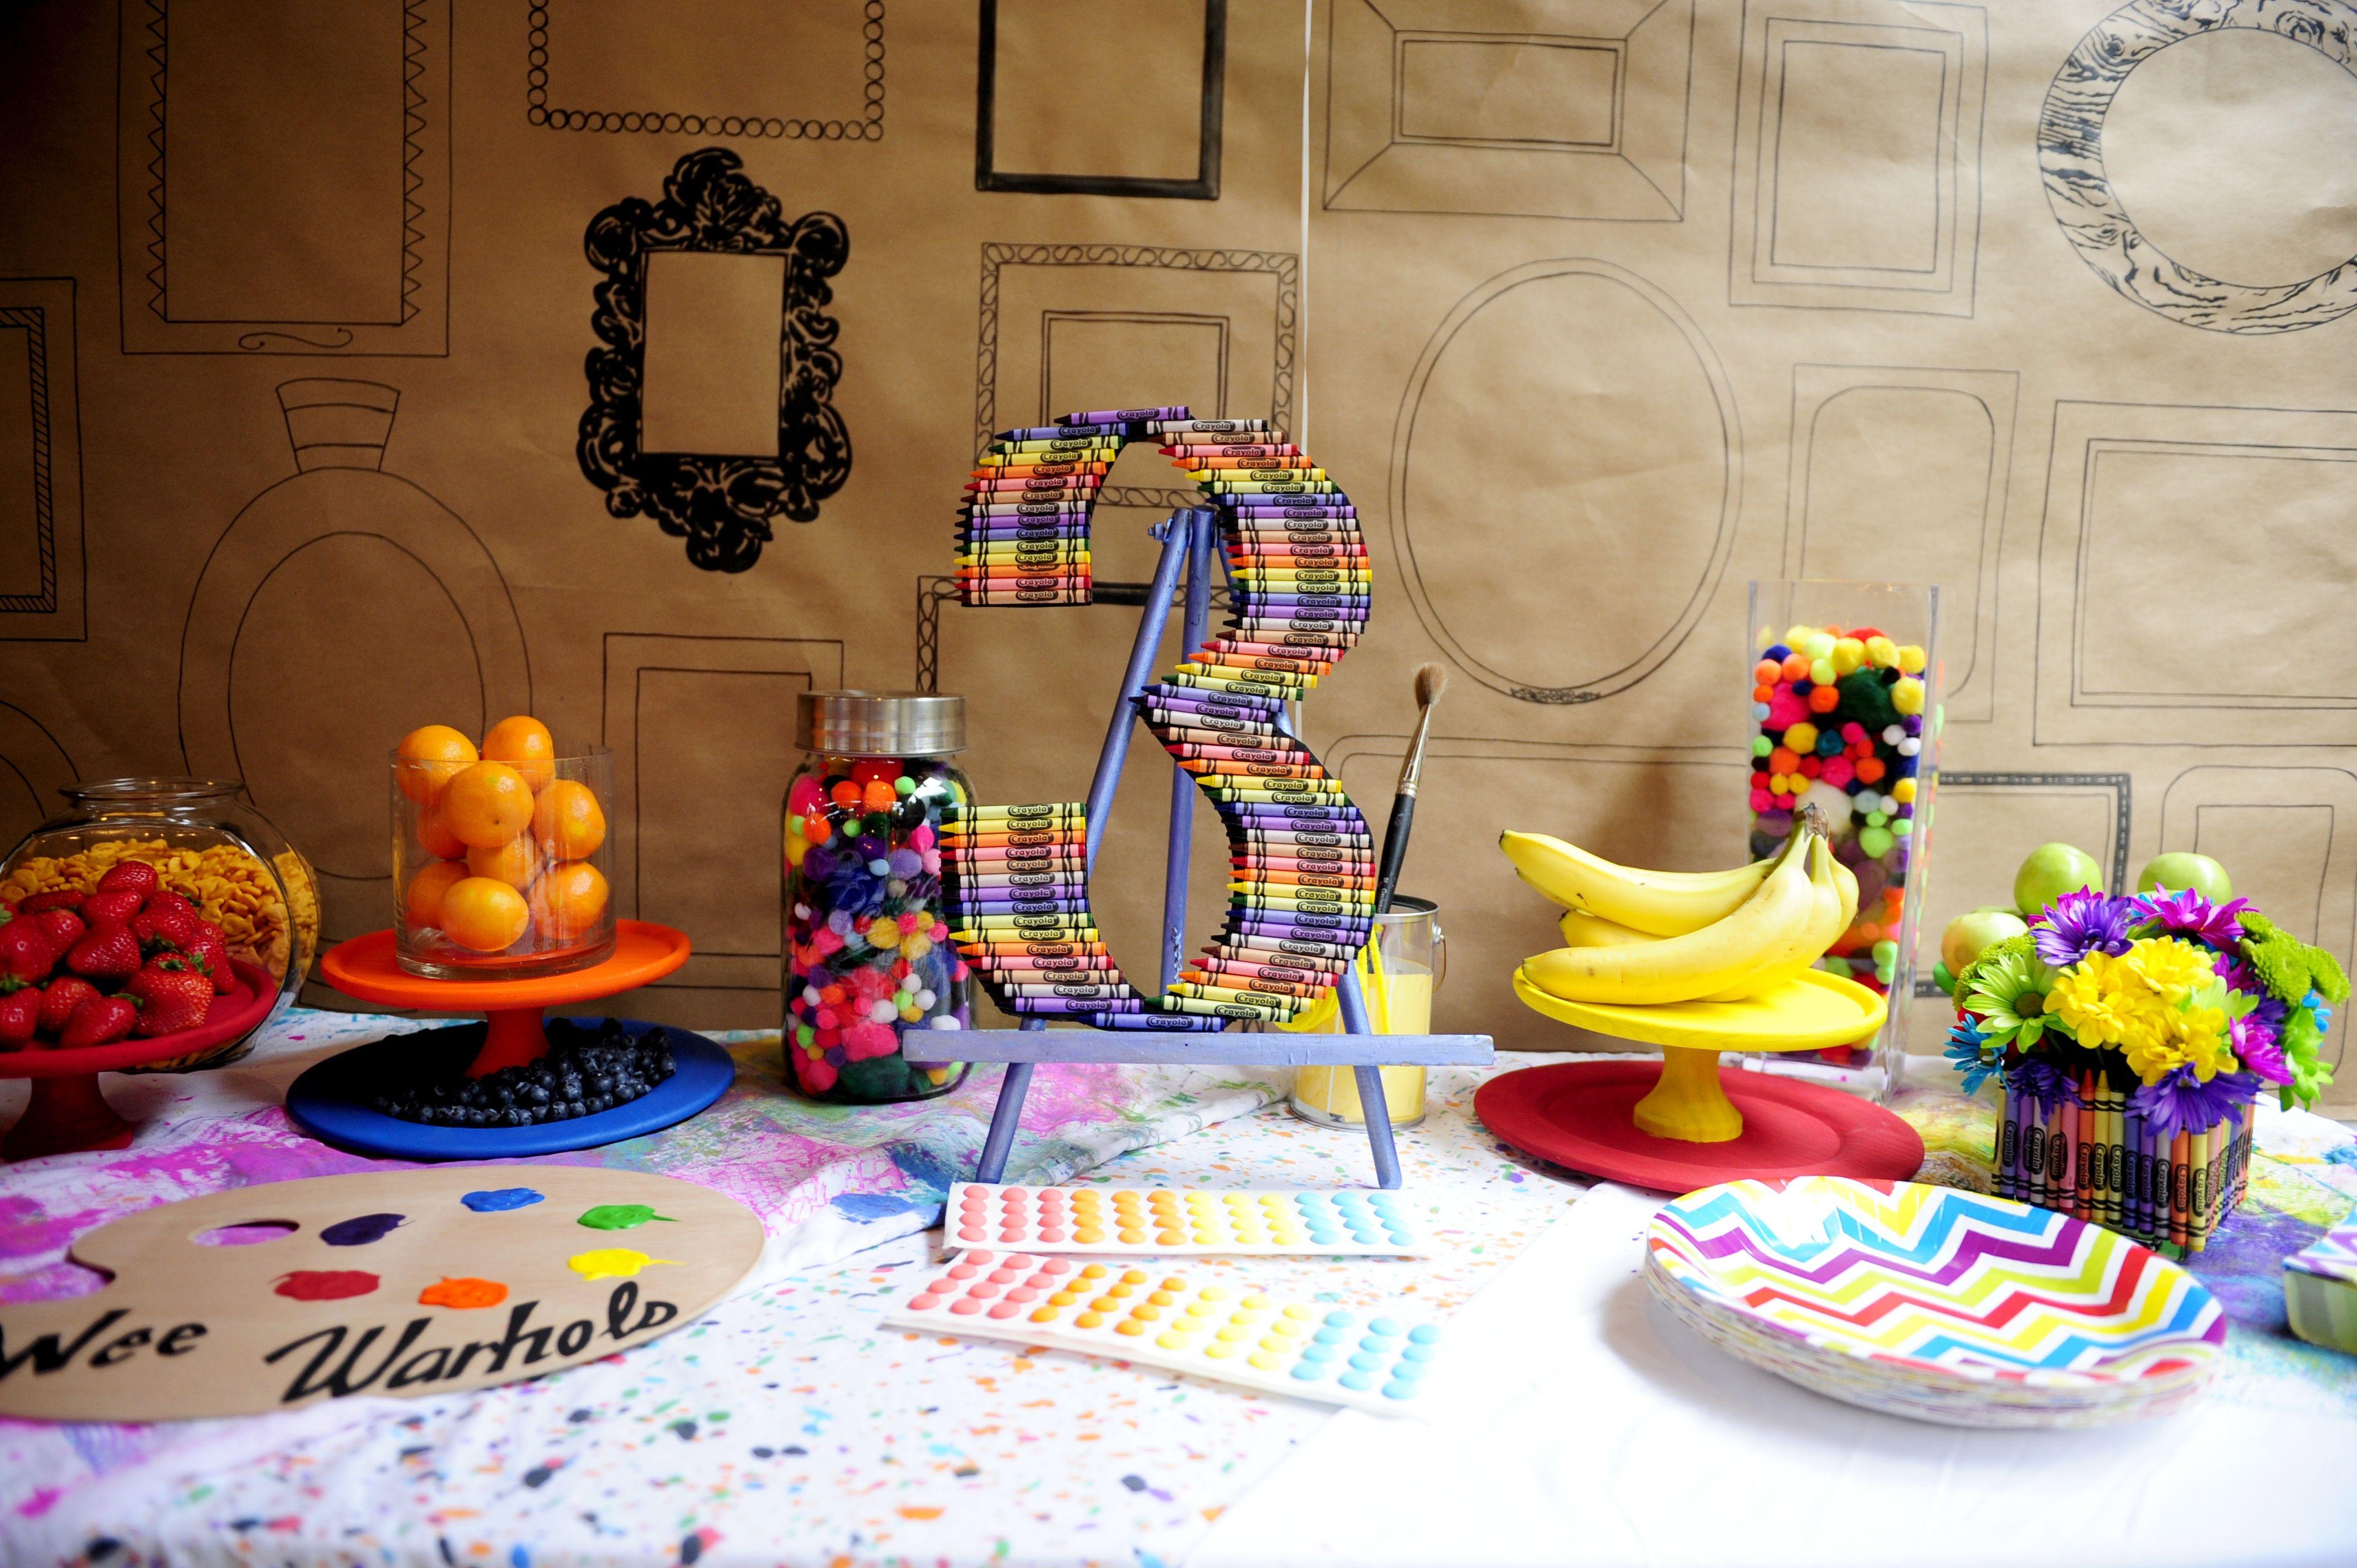 Wee Warhols Art Birthday Party- Table Display  www.facebook.com/weewarhols